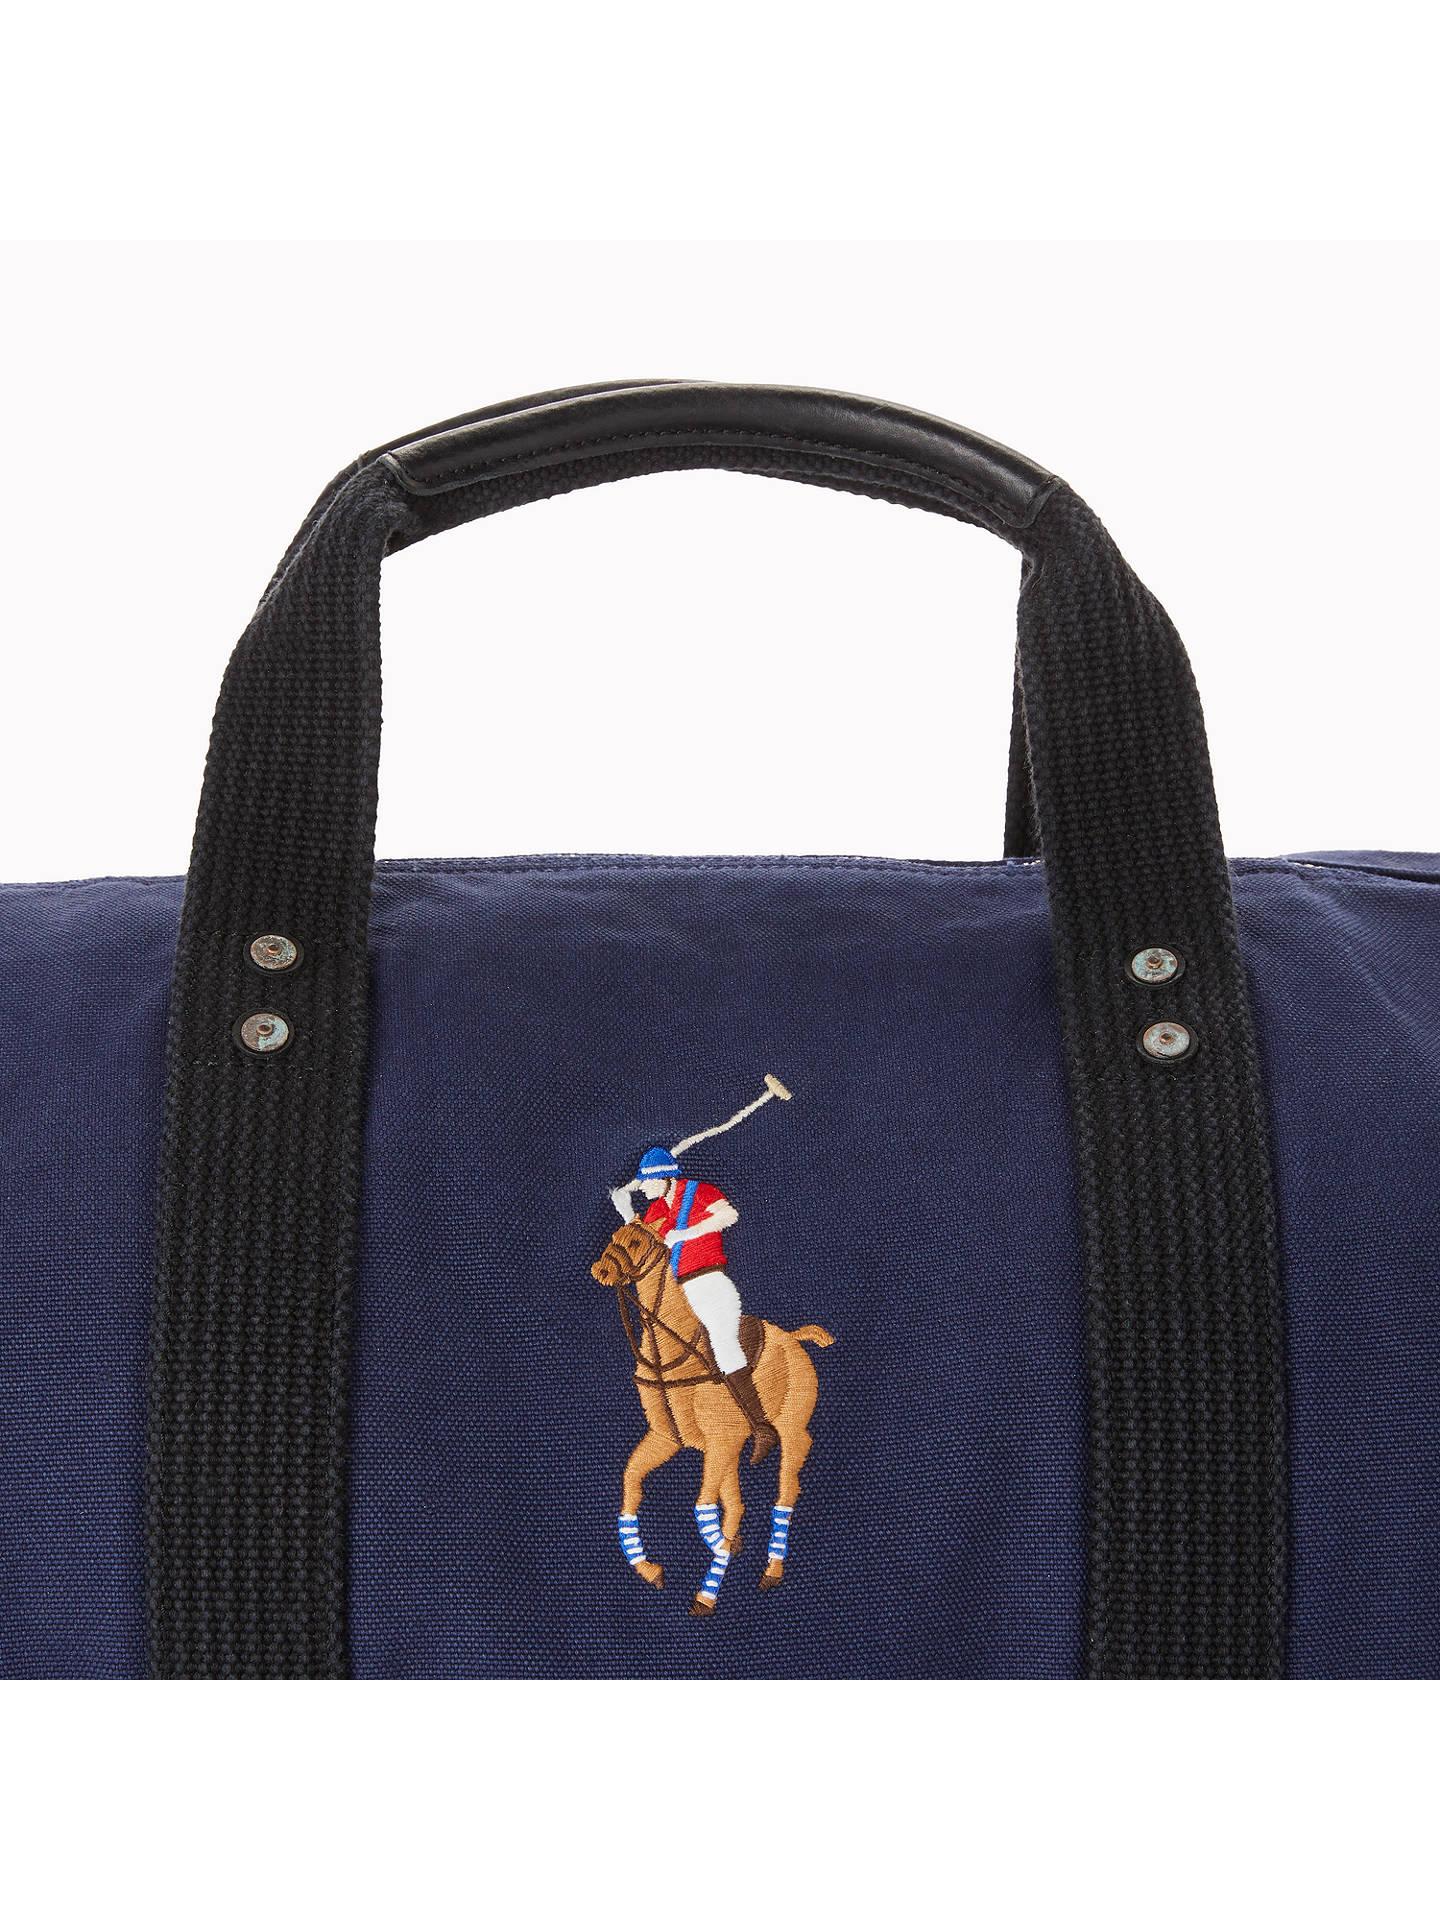 ... BuyPolo Ralph Lauren Canvas Big Pony Duffle Bag, Navy Online at  johnlewis.com 34d21f45bf